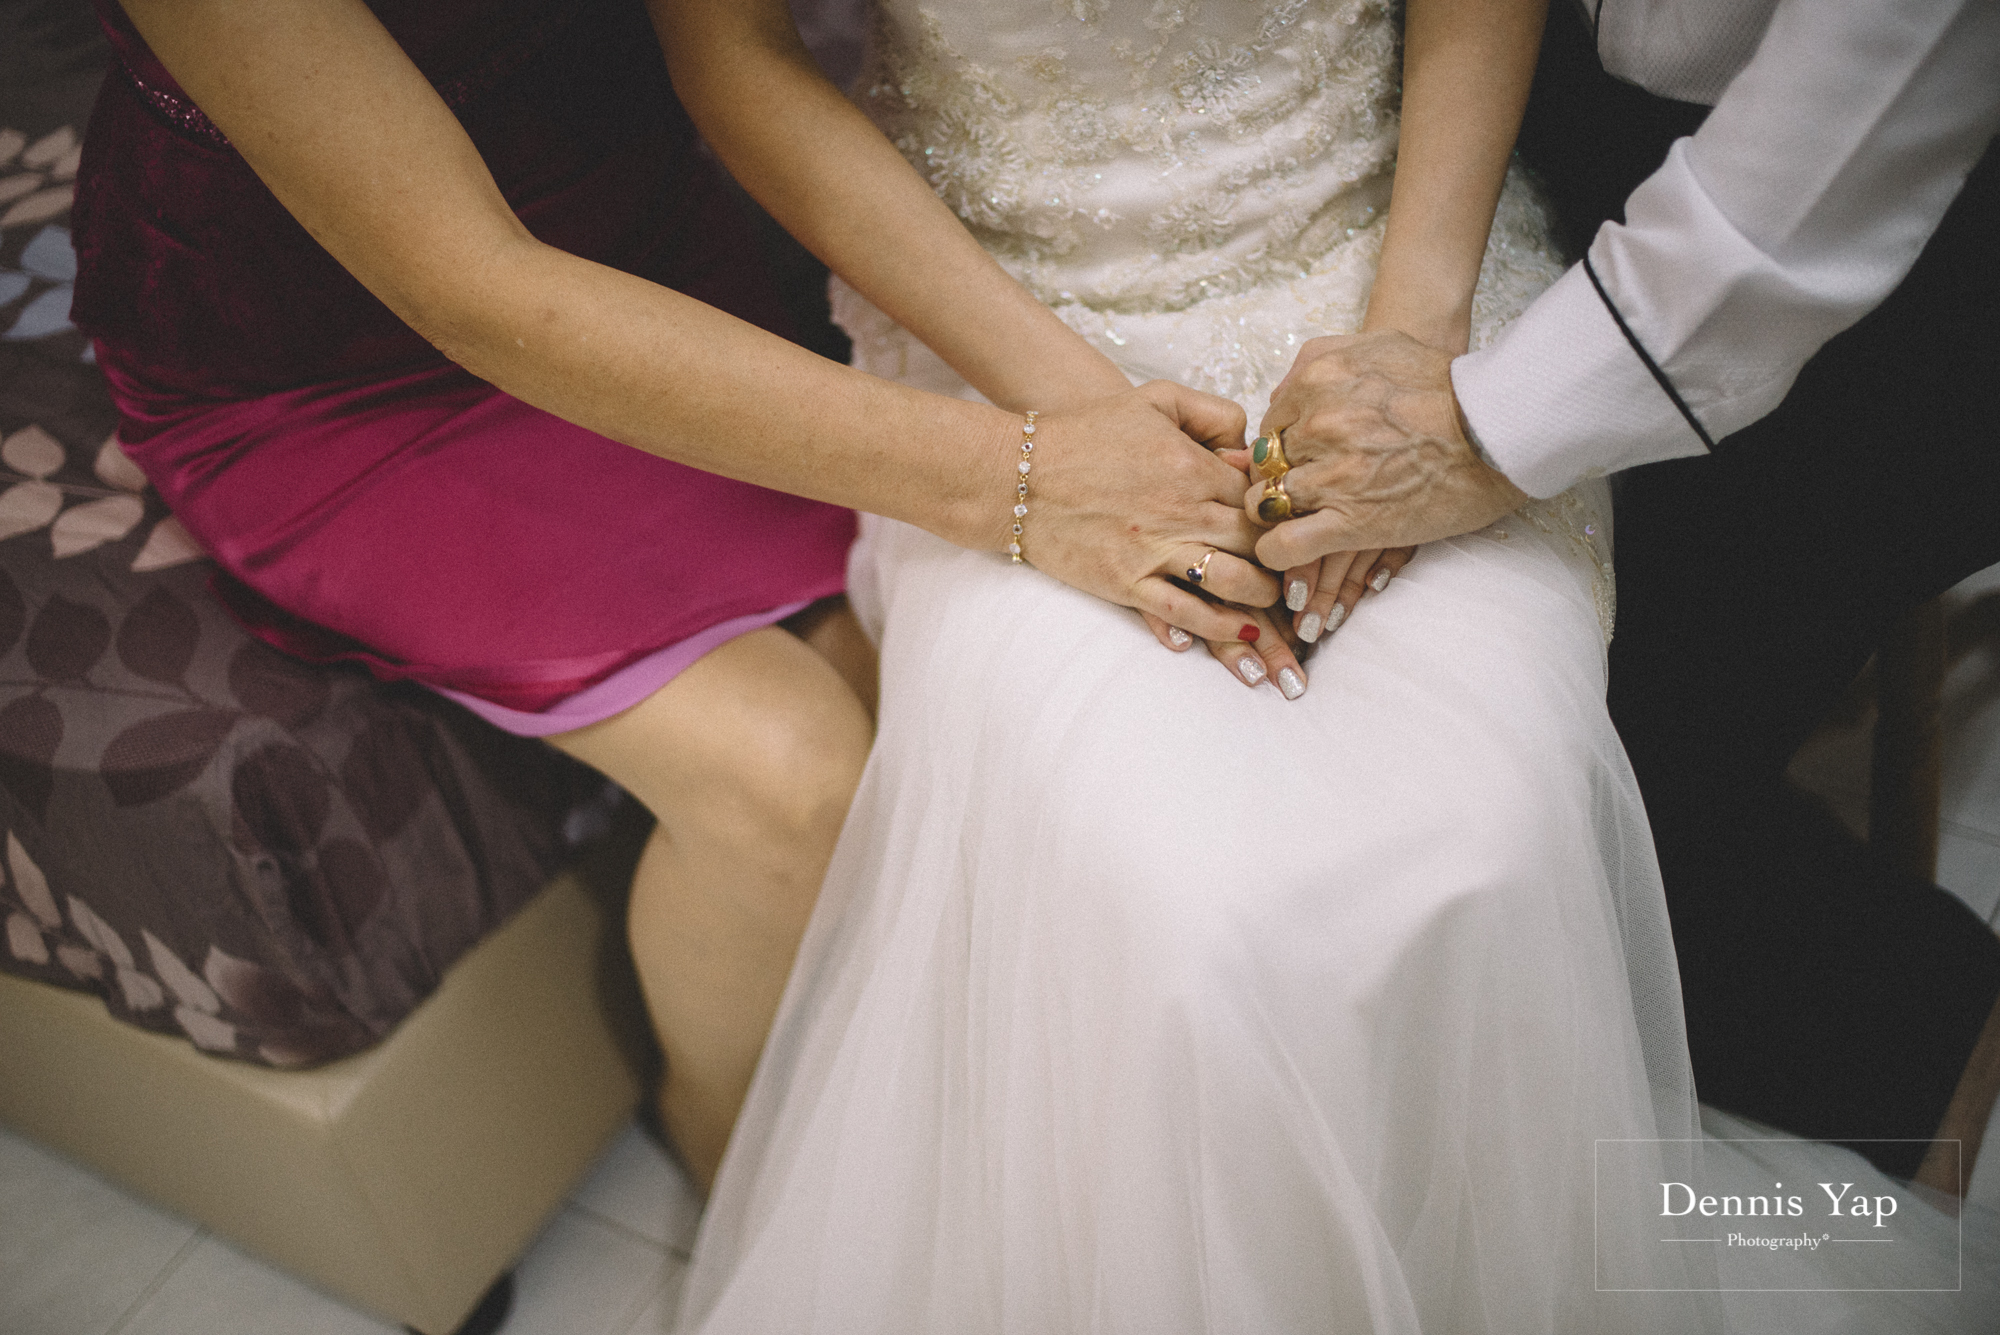 alex shir ley wedding day gate crash subang jaya usj dennis yap photography moments-3.jpg